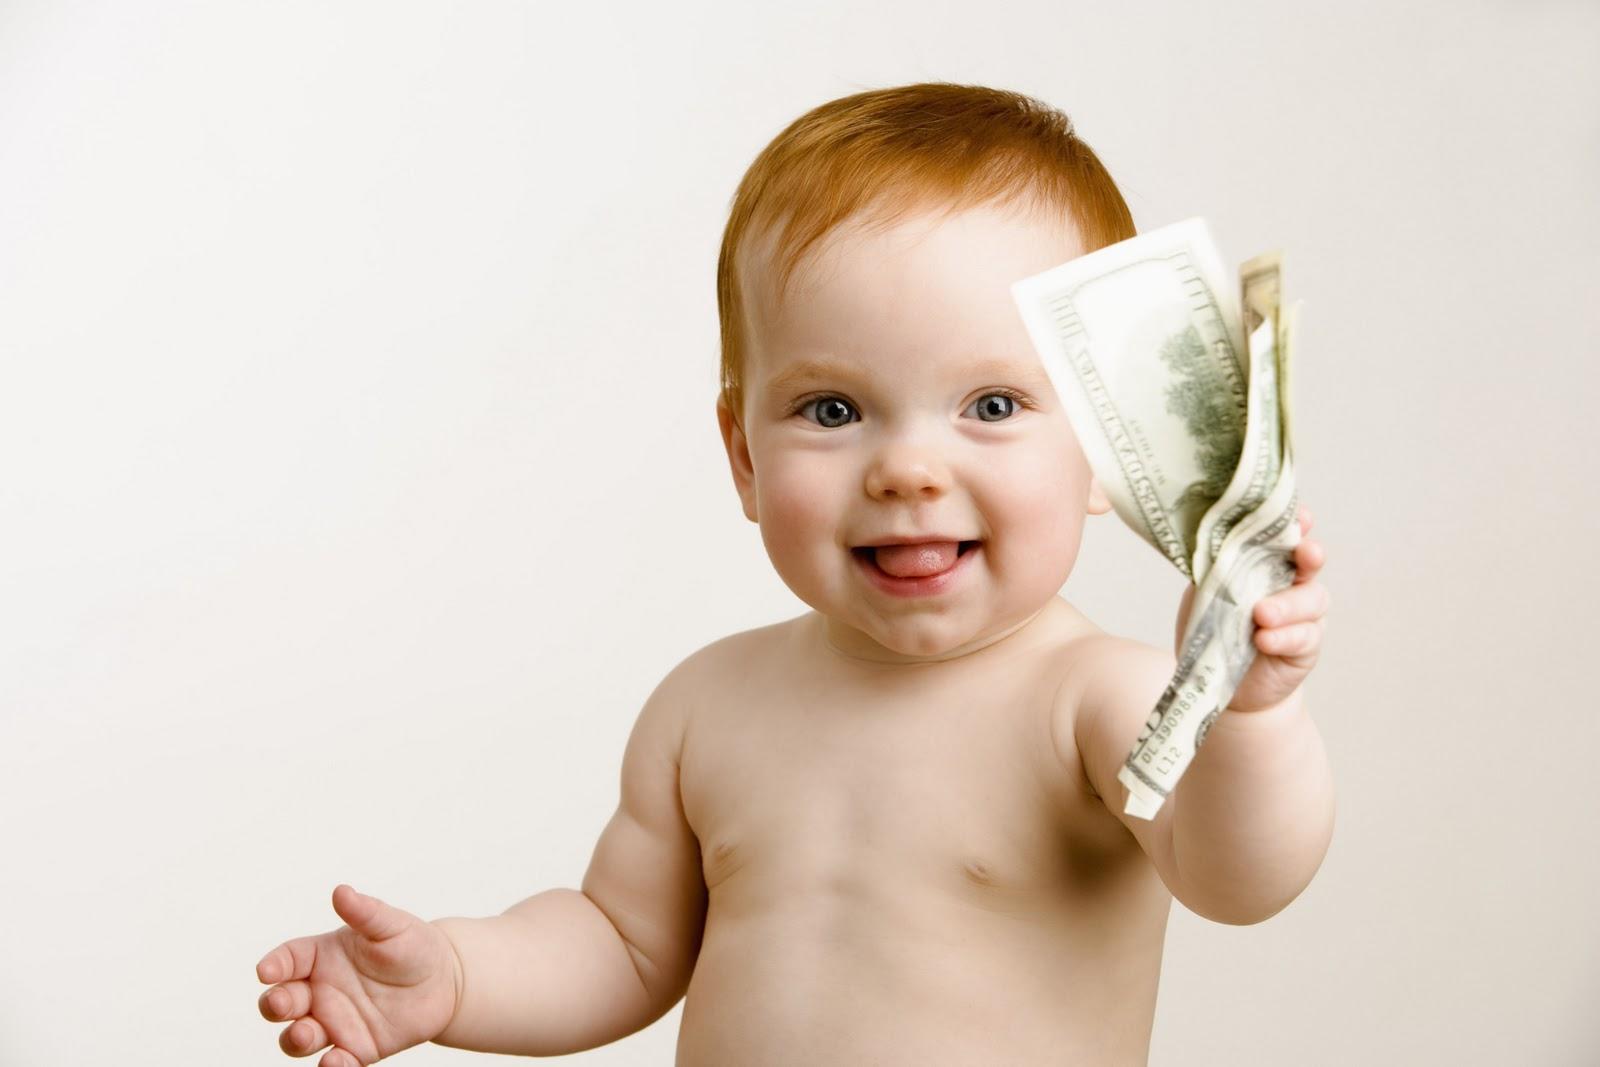 Сколько платят за опекунство над ребенком в 2020 году